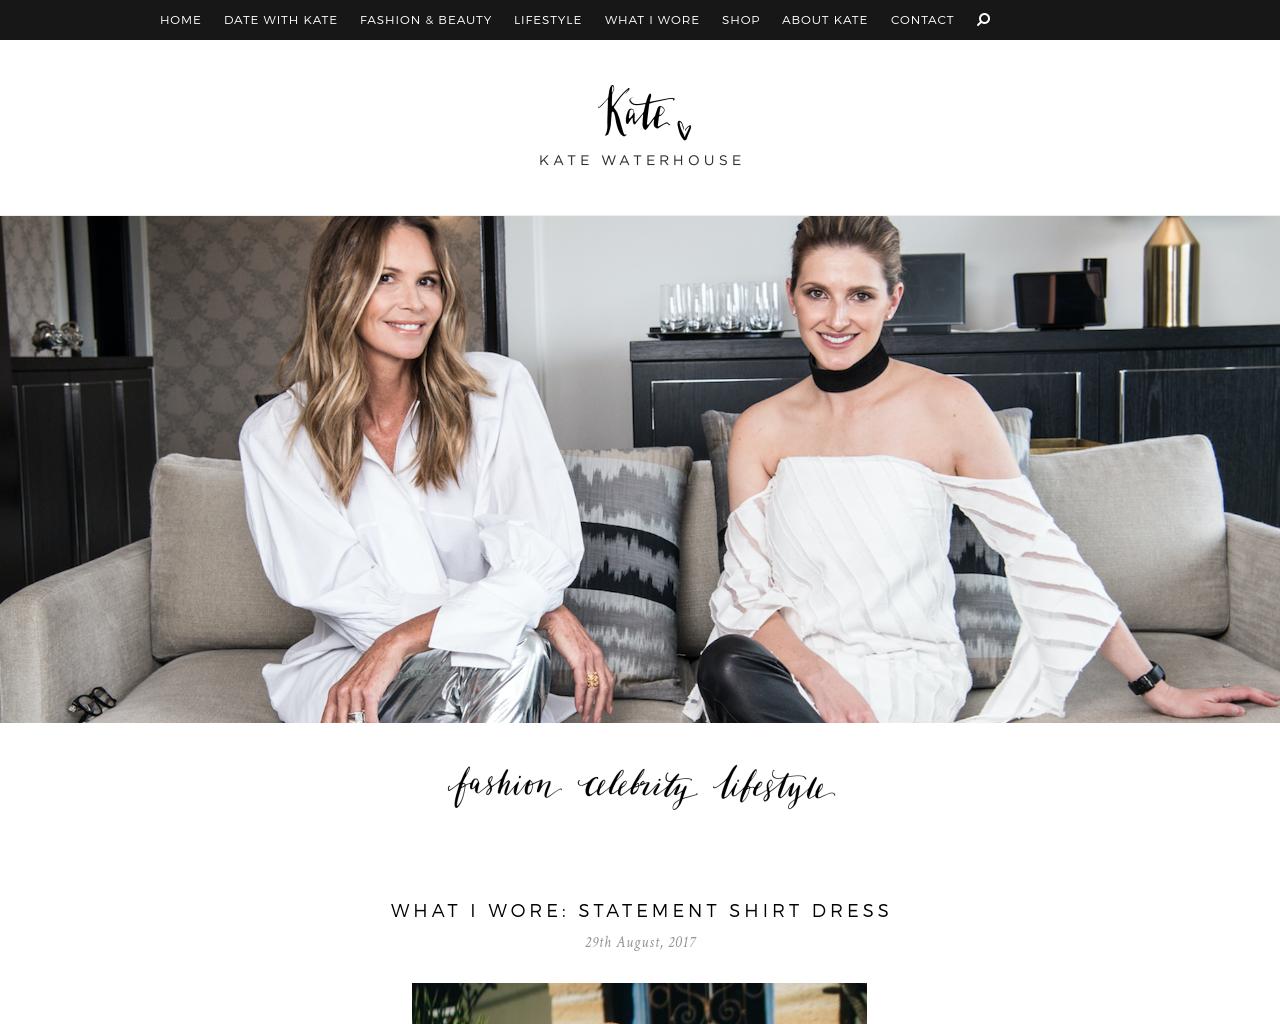 Kate-Waterhouse-Advertising-Reviews-Pricing